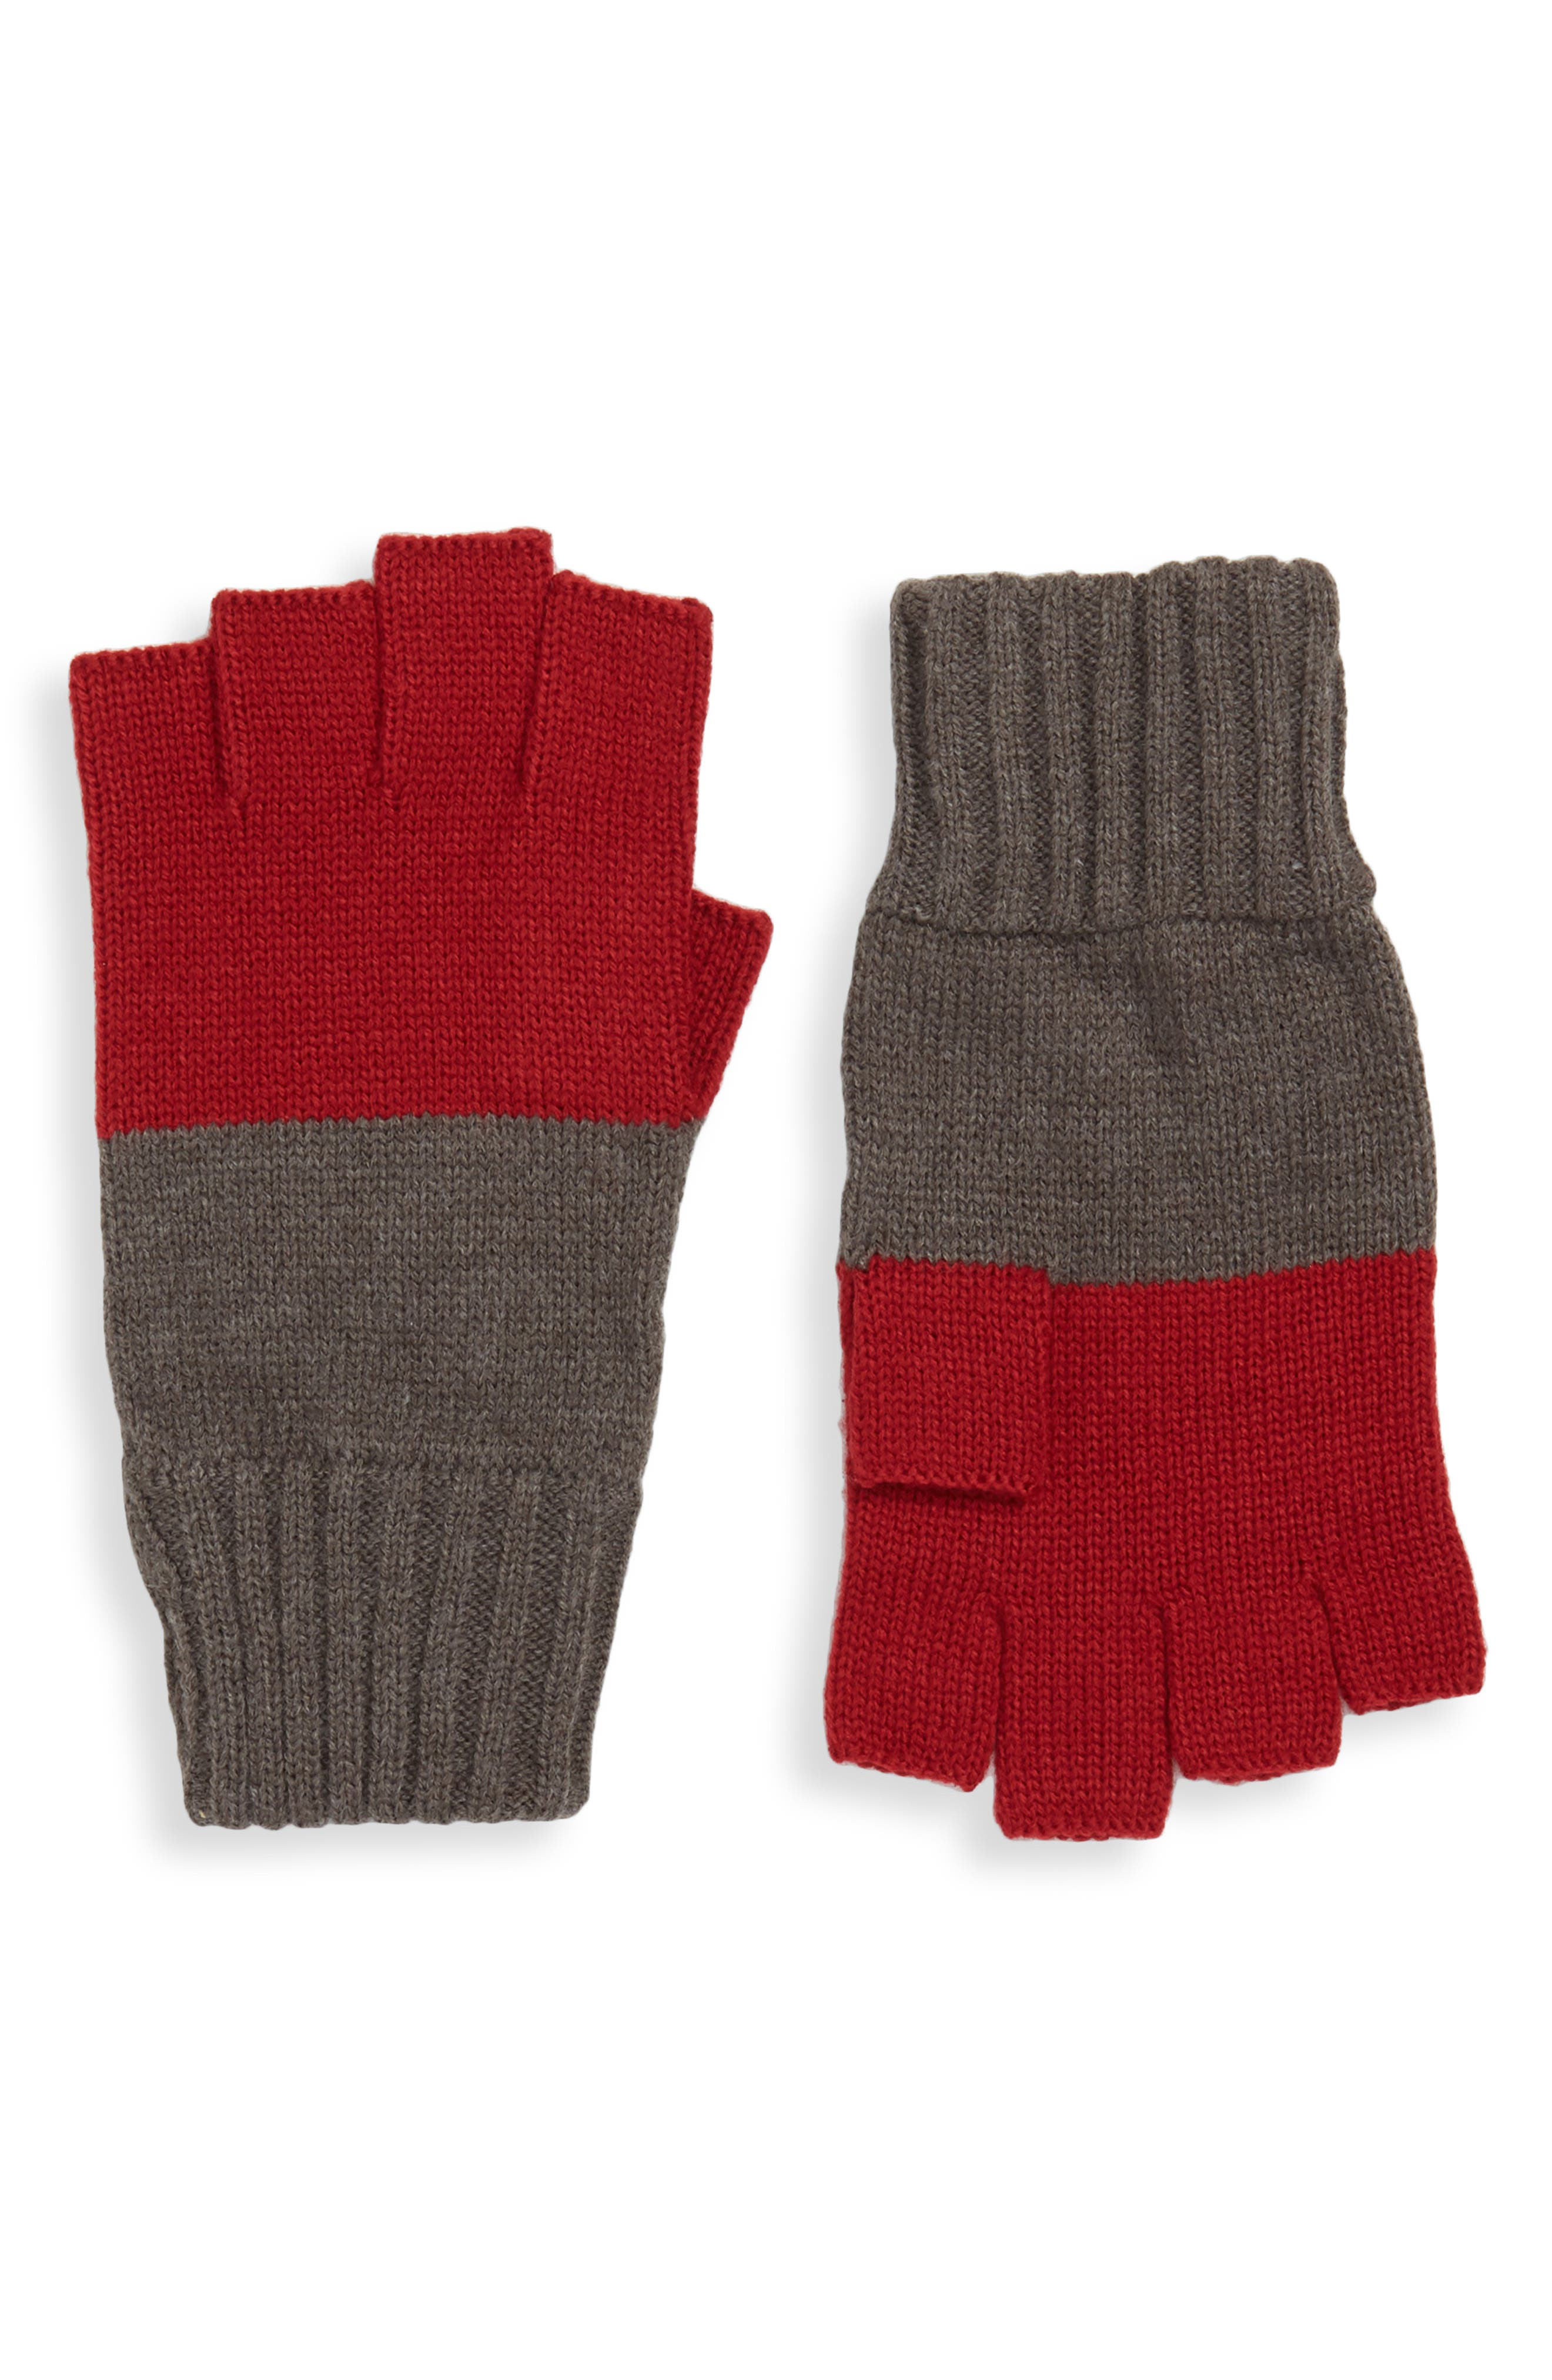 THE RAIL,                             Colorblock Fingerless Gloves,                             Main thumbnail 1, color,                             021